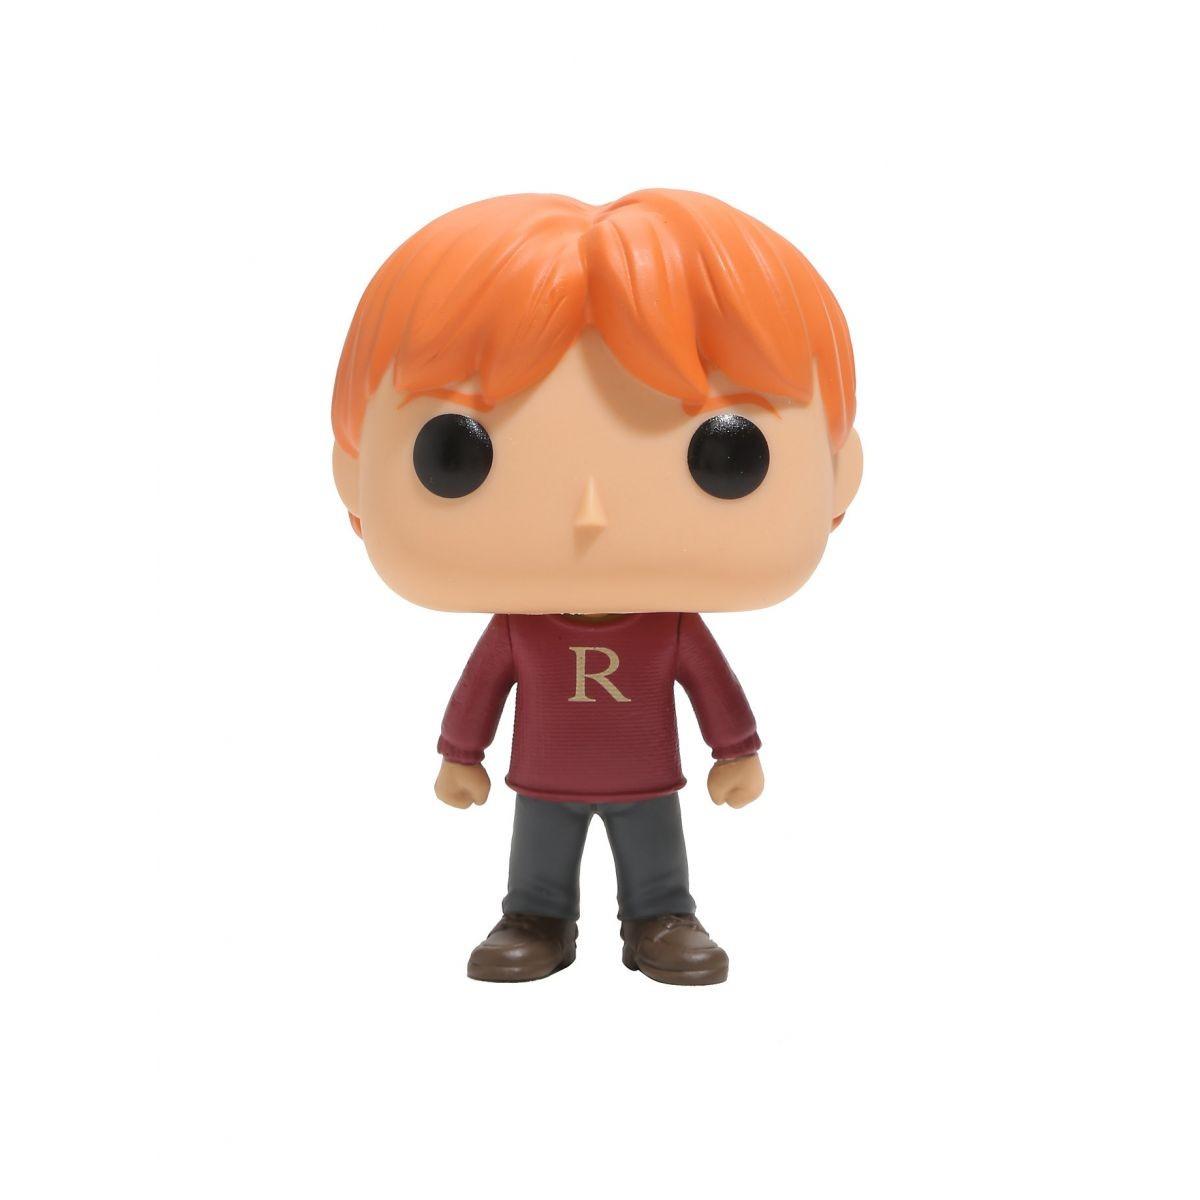 Funko POP! Harry Potter - Ron Weasley 28 - Exclusivo - Funko